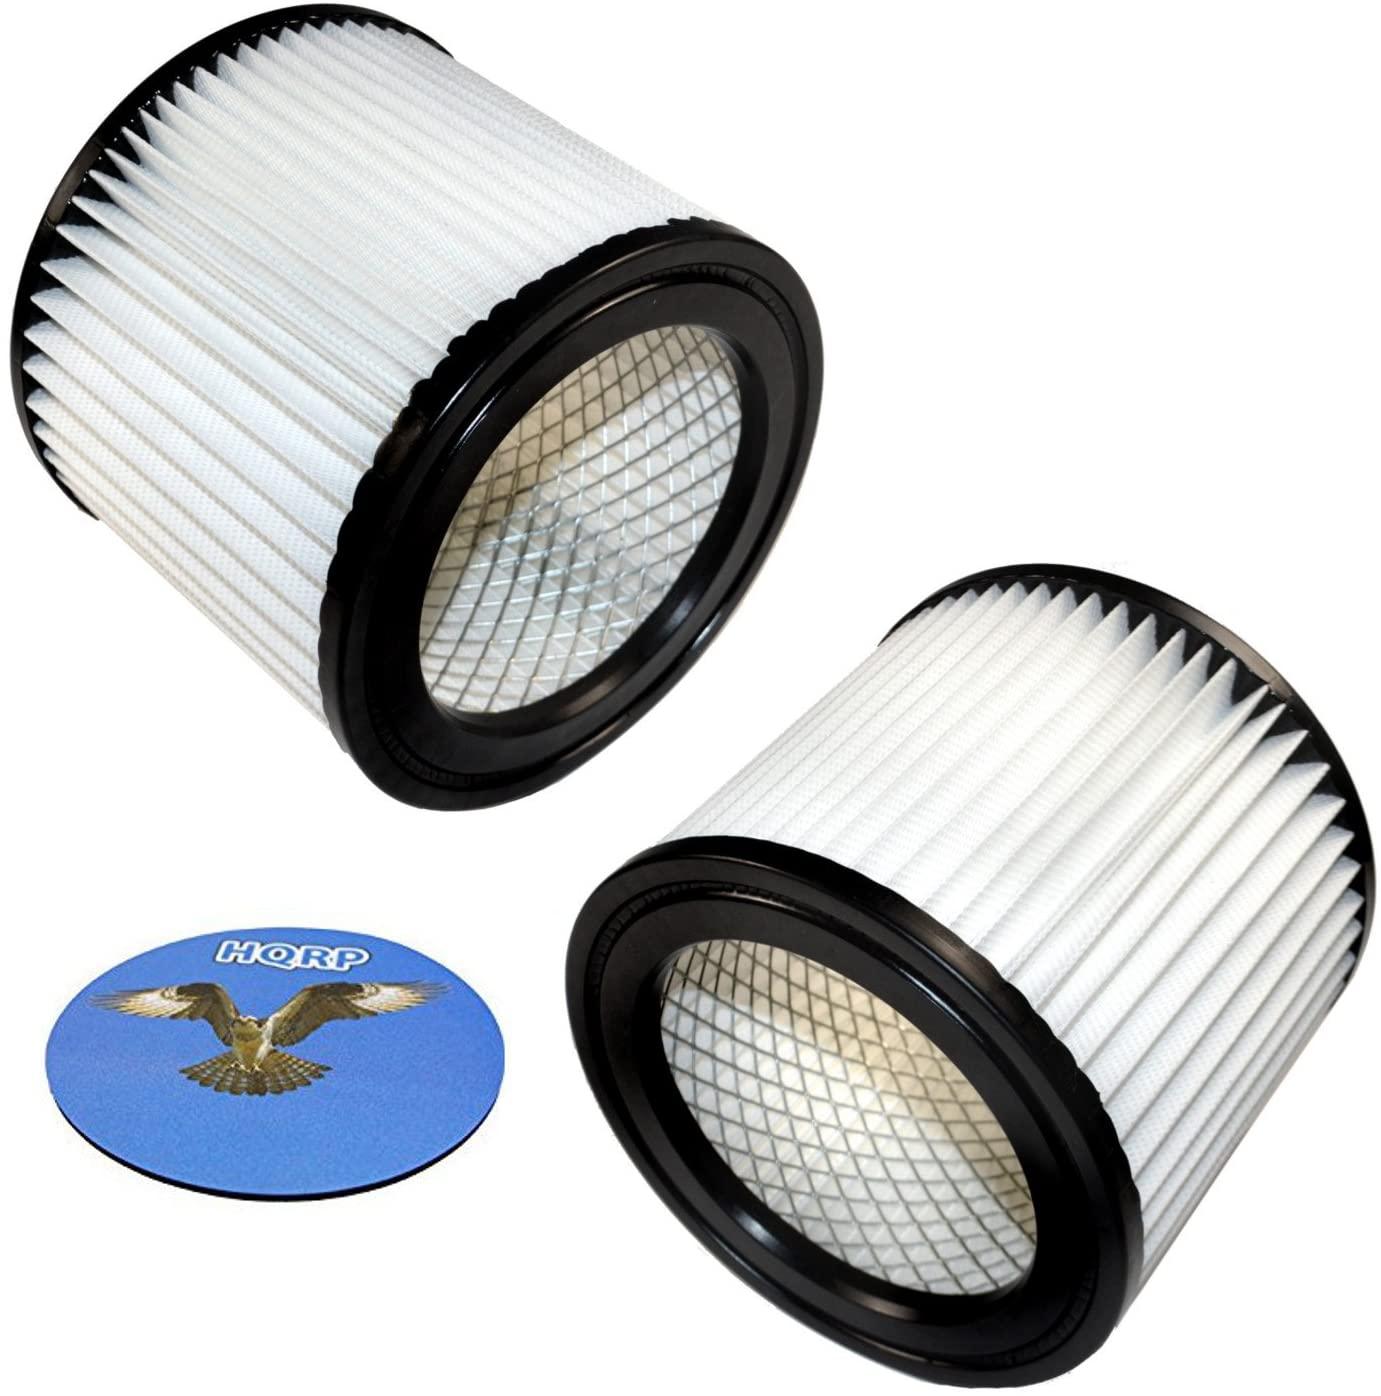 HQRP 2-pack Cartridge Filter for Shop-vac 2TM350A 3HM300A 5HM400 5HM450 5HM500 Wall Mount Wet Dry Vacuum + HQRP Coaster